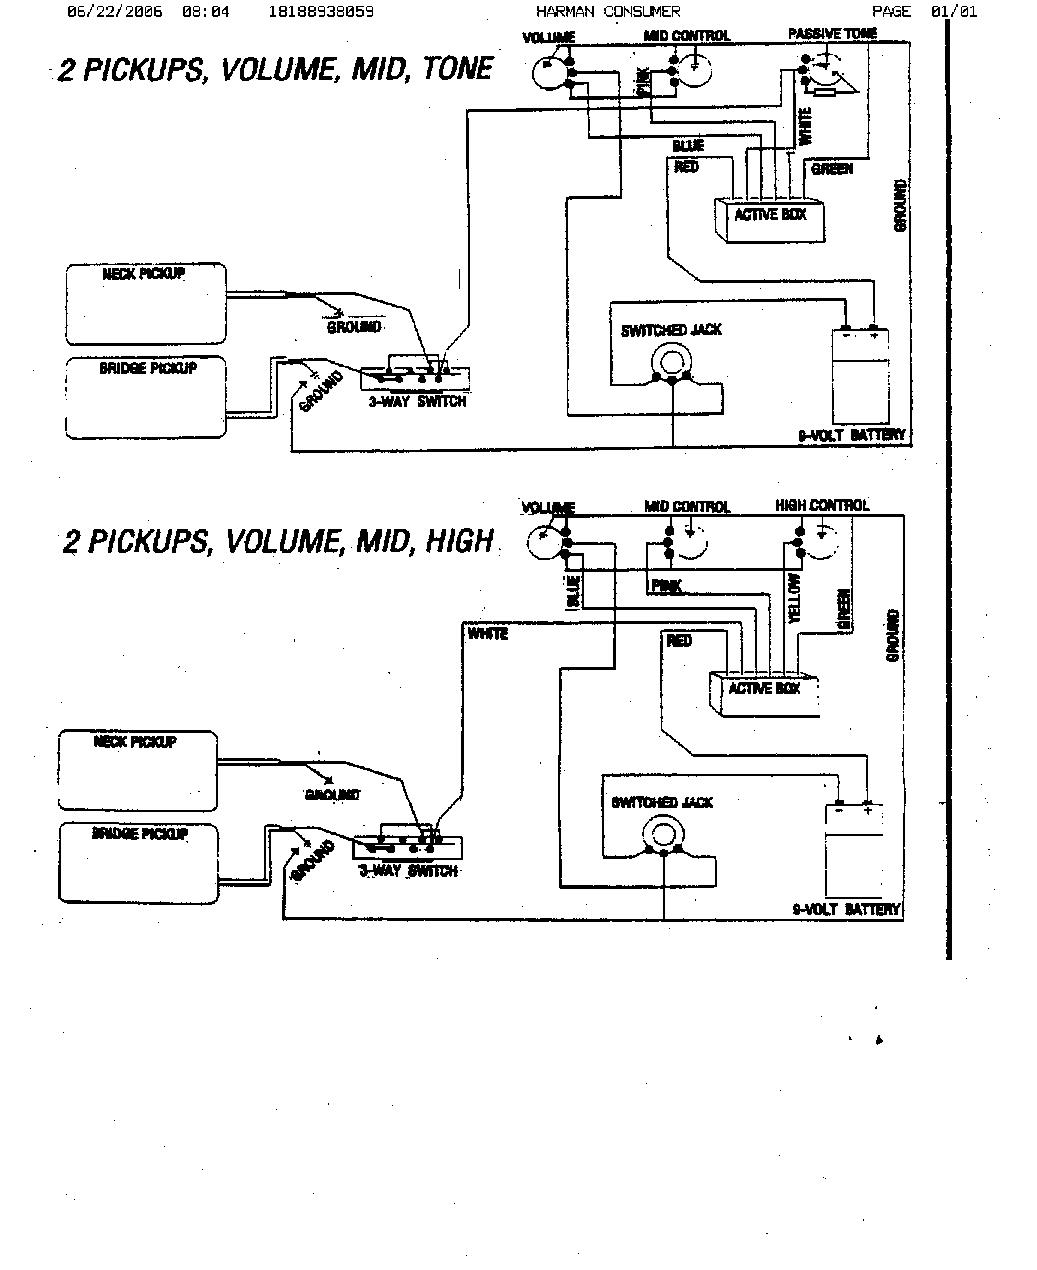 Ssh Wiring Diagrams Get Free Image About Wiring Diagram